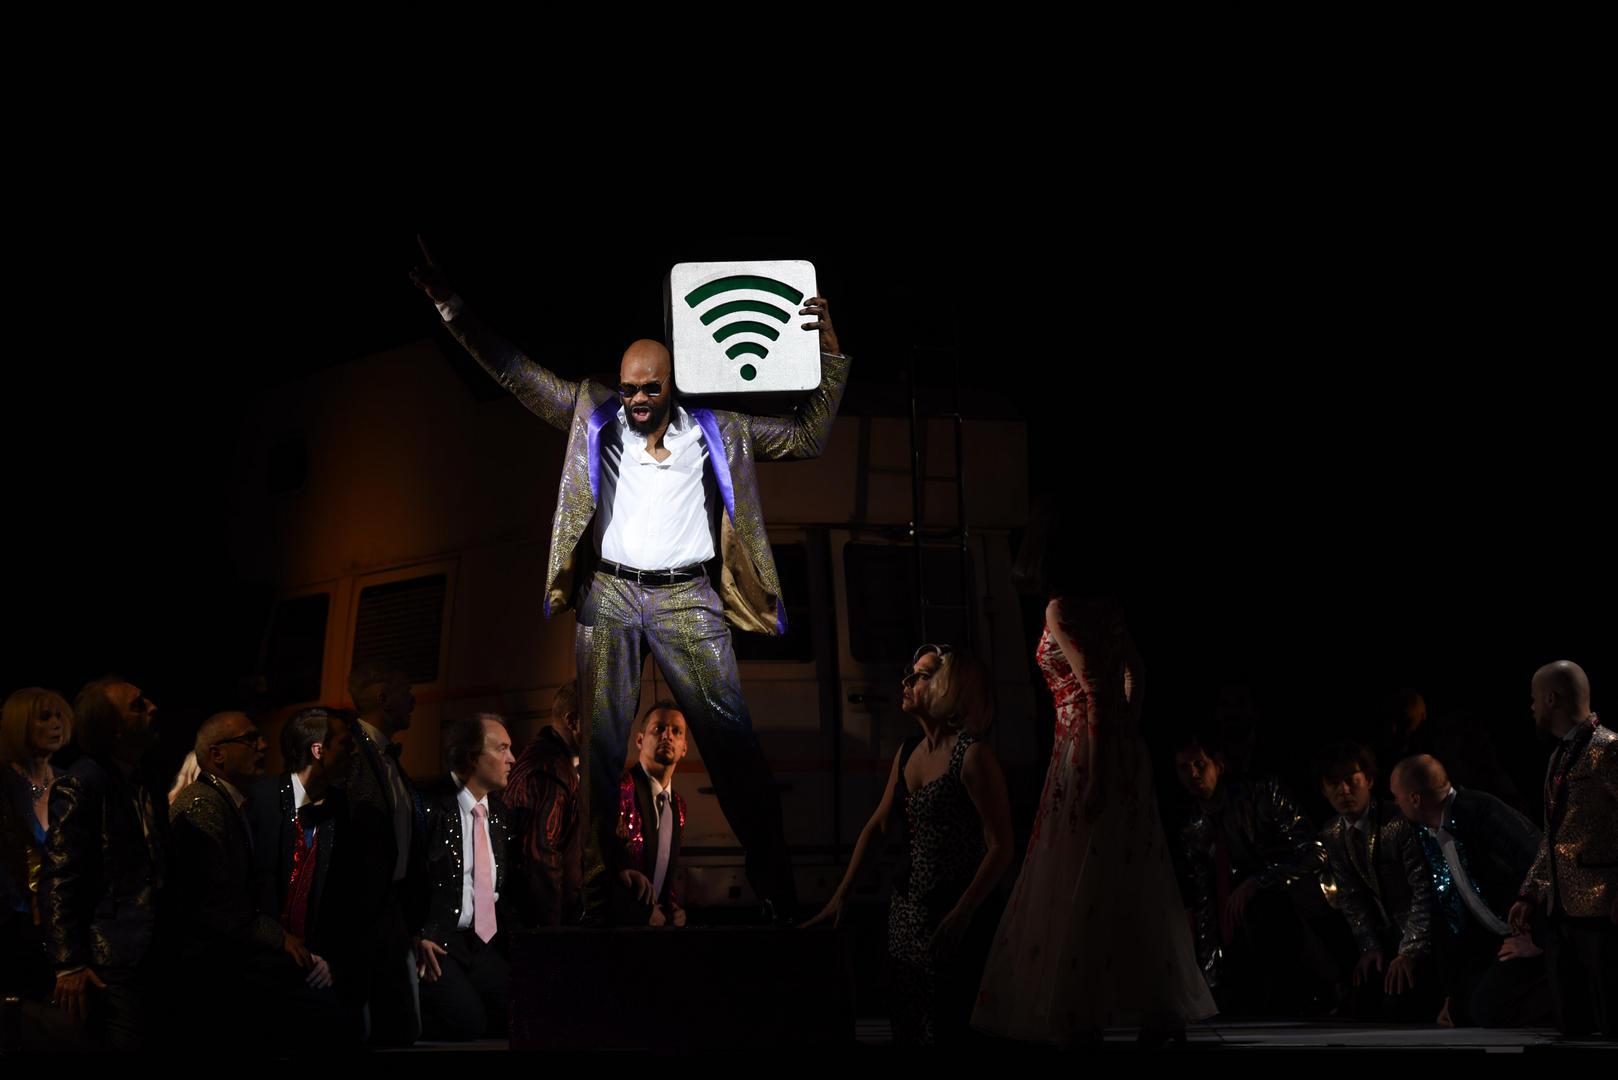 Mahagonny-Opera-by-Kurt-Weill-Stage-director-Jacopo-Spirei-Salzburg-23